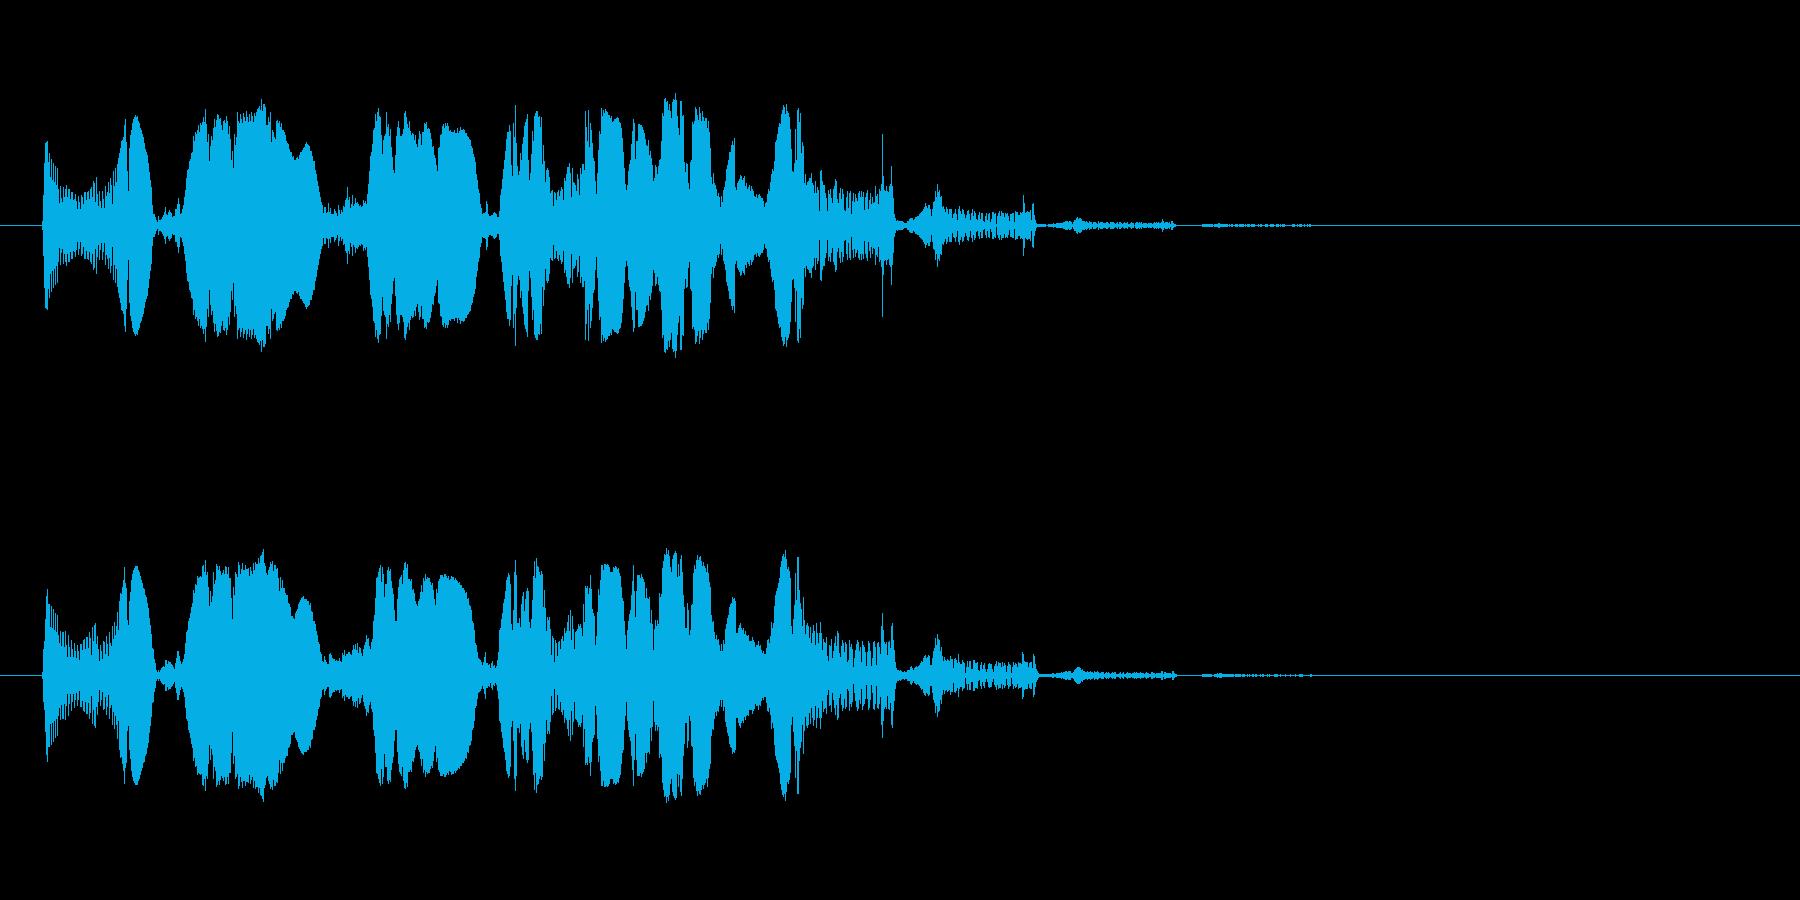 【SE 効果音】SF的な音の再生済みの波形